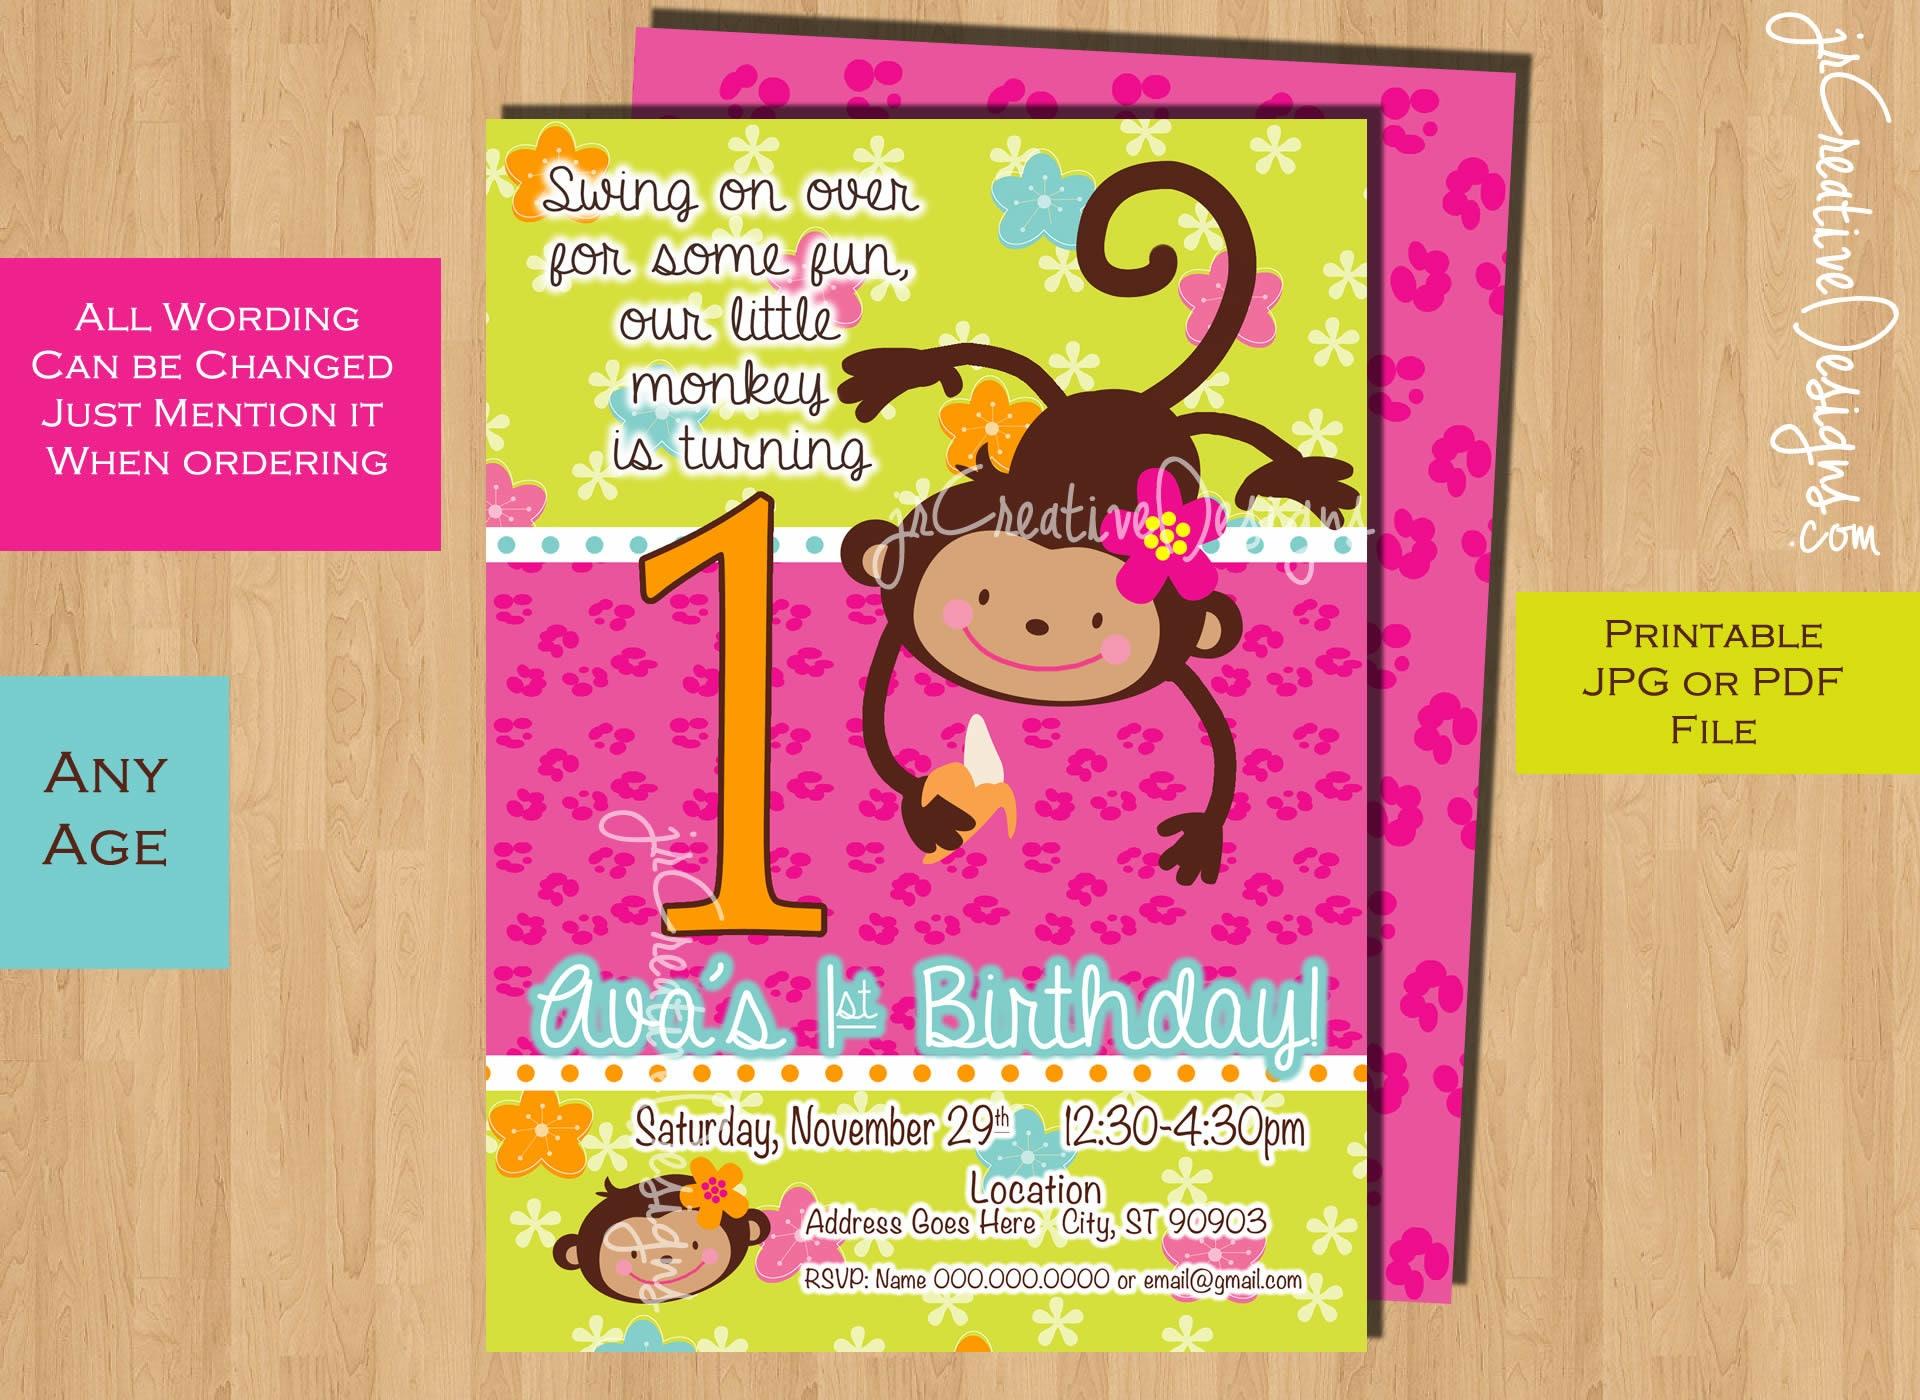 Monkey Love invite Birthday Invite 1 year old 2 years